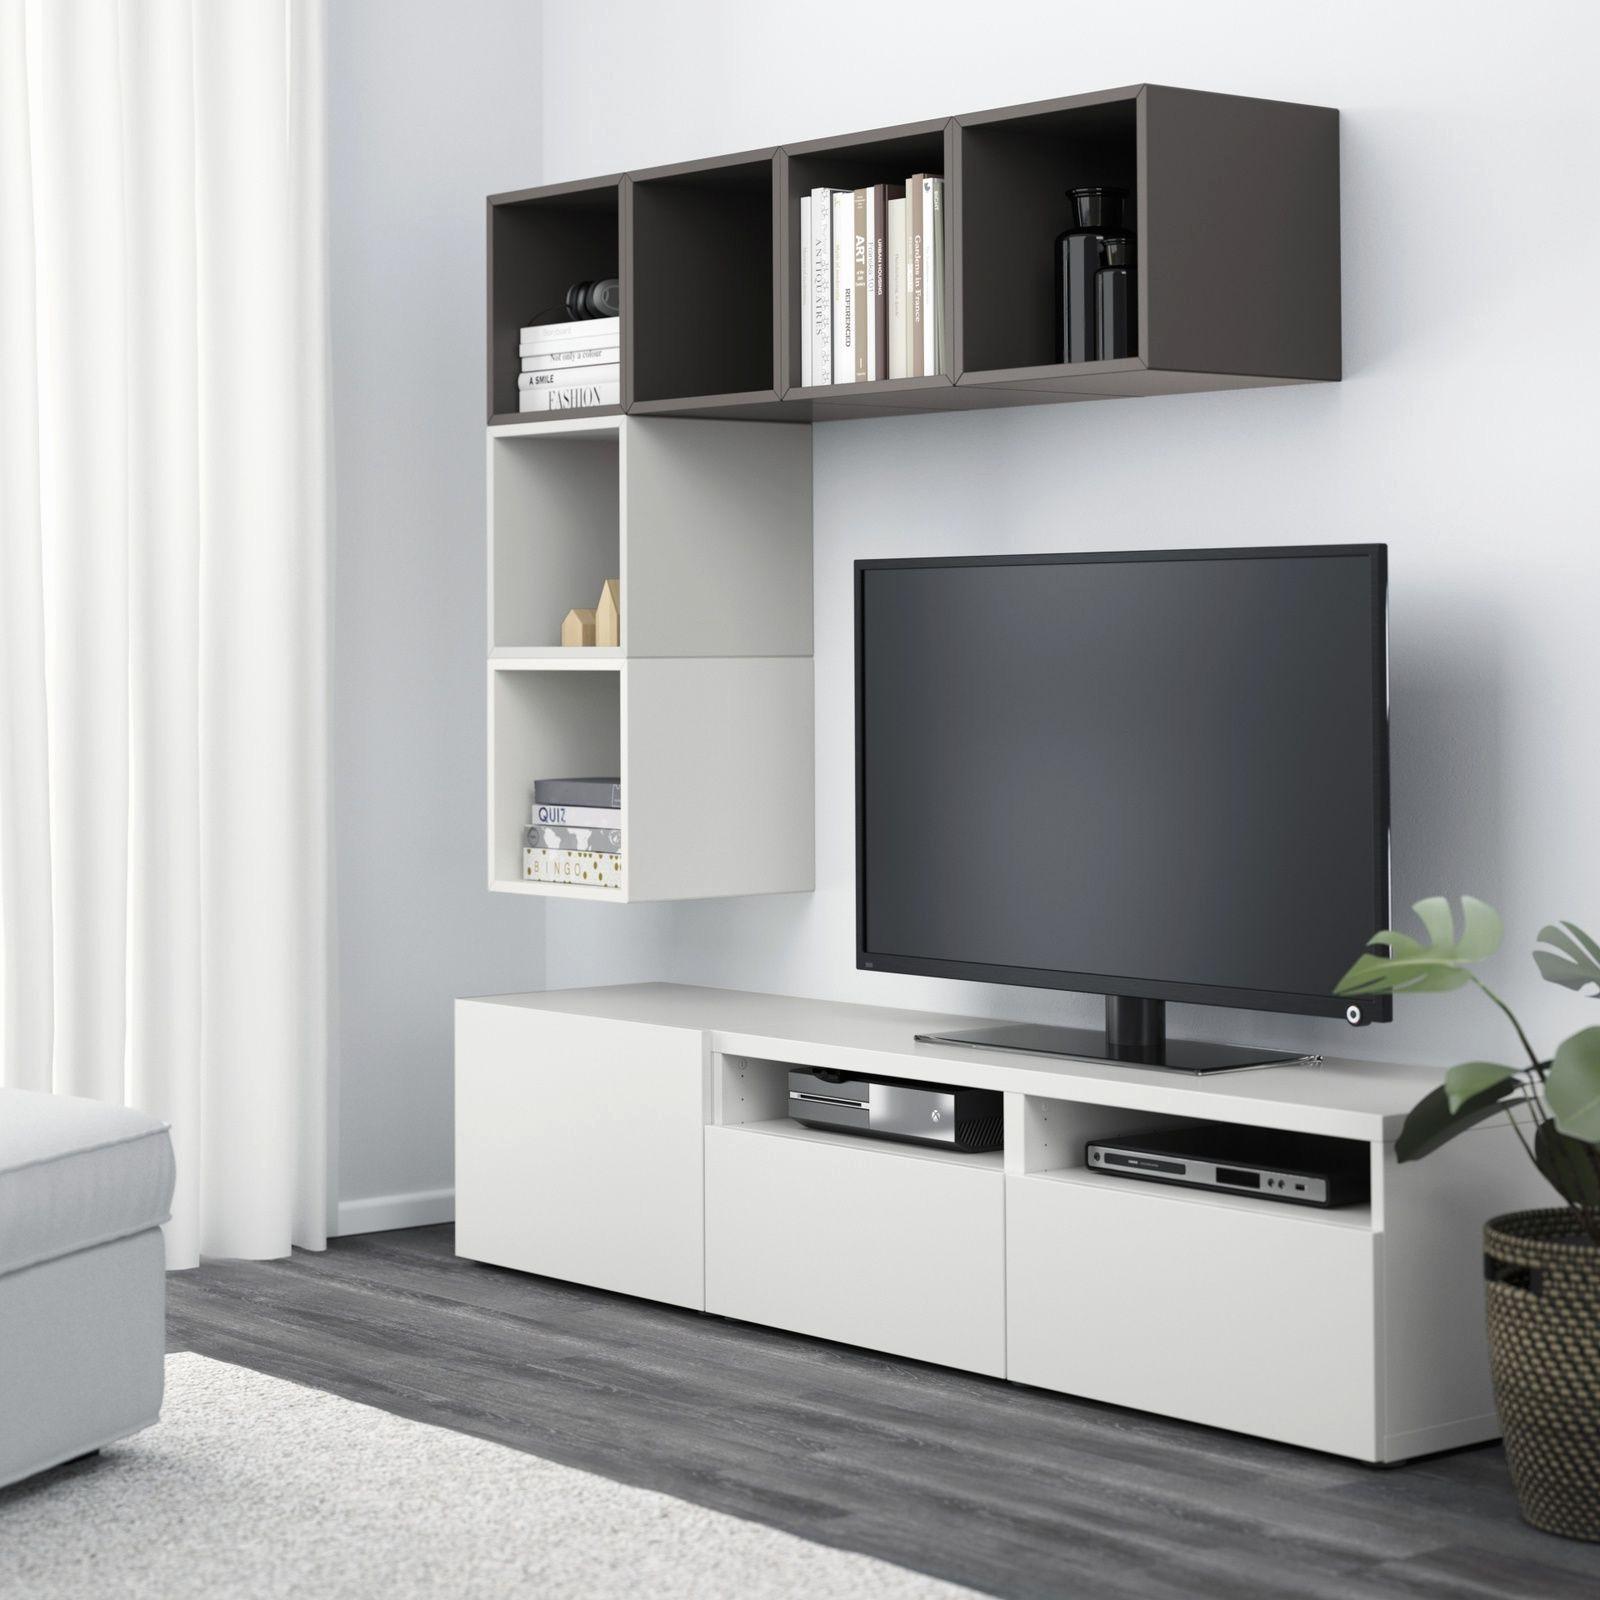 meuble tv suspendu led meuble tv mural suspendu nouveau meuble tv suspendu led 85 of meuble tv suspendu led